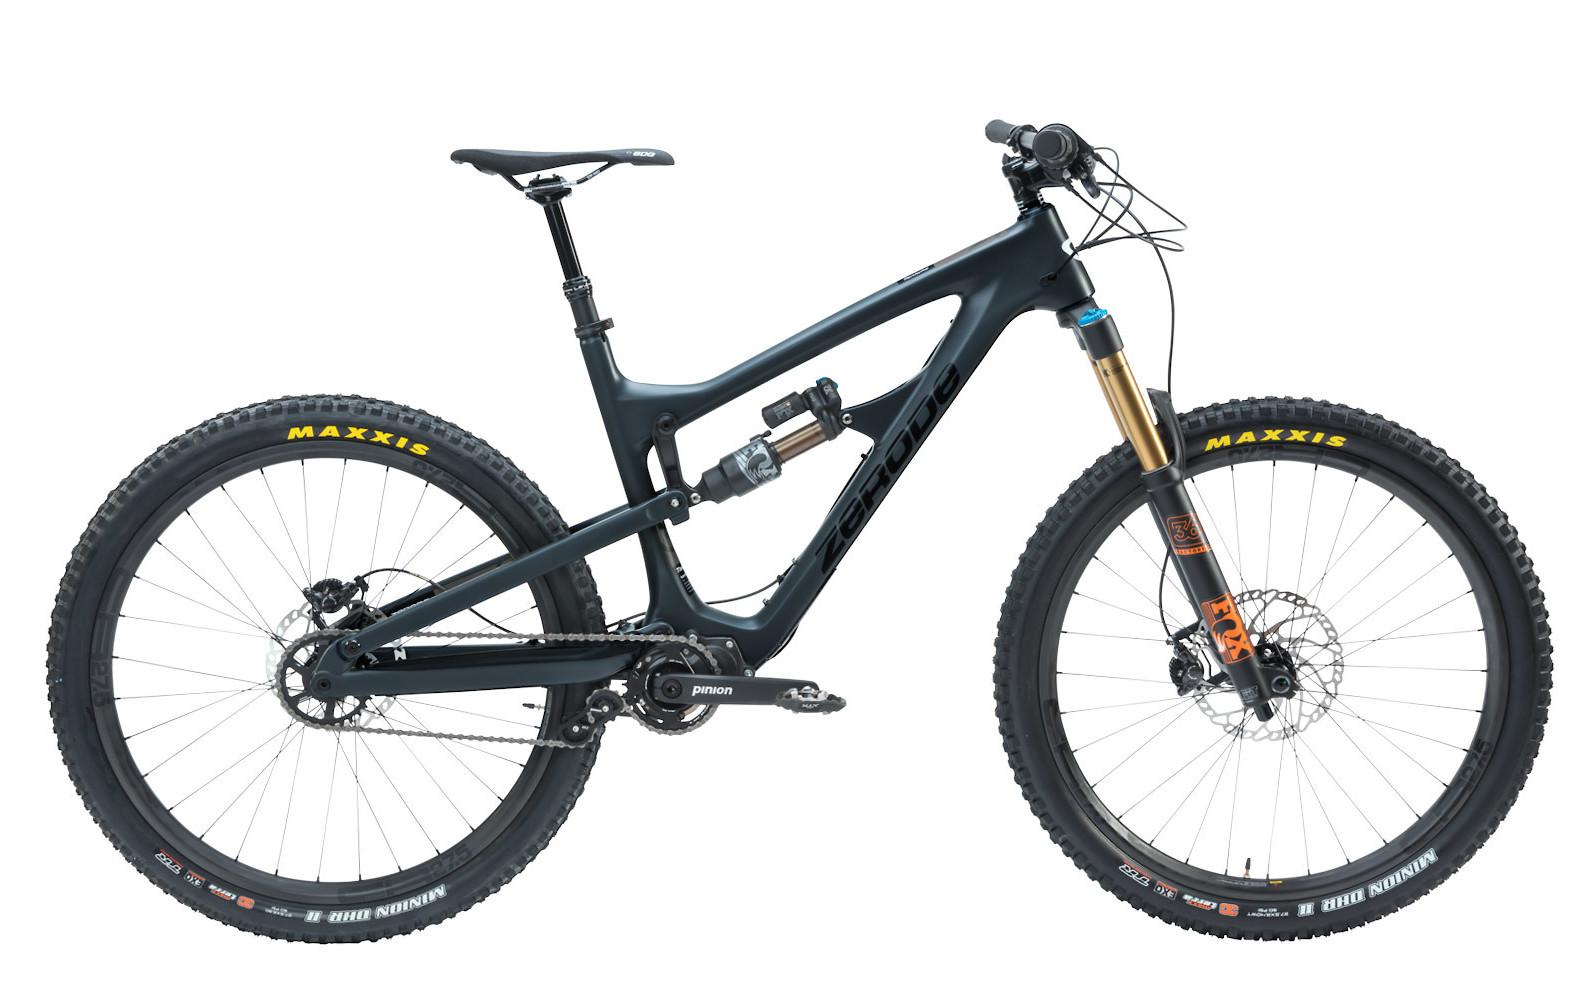 2019 Zerode Taniwha Signature Build Bike